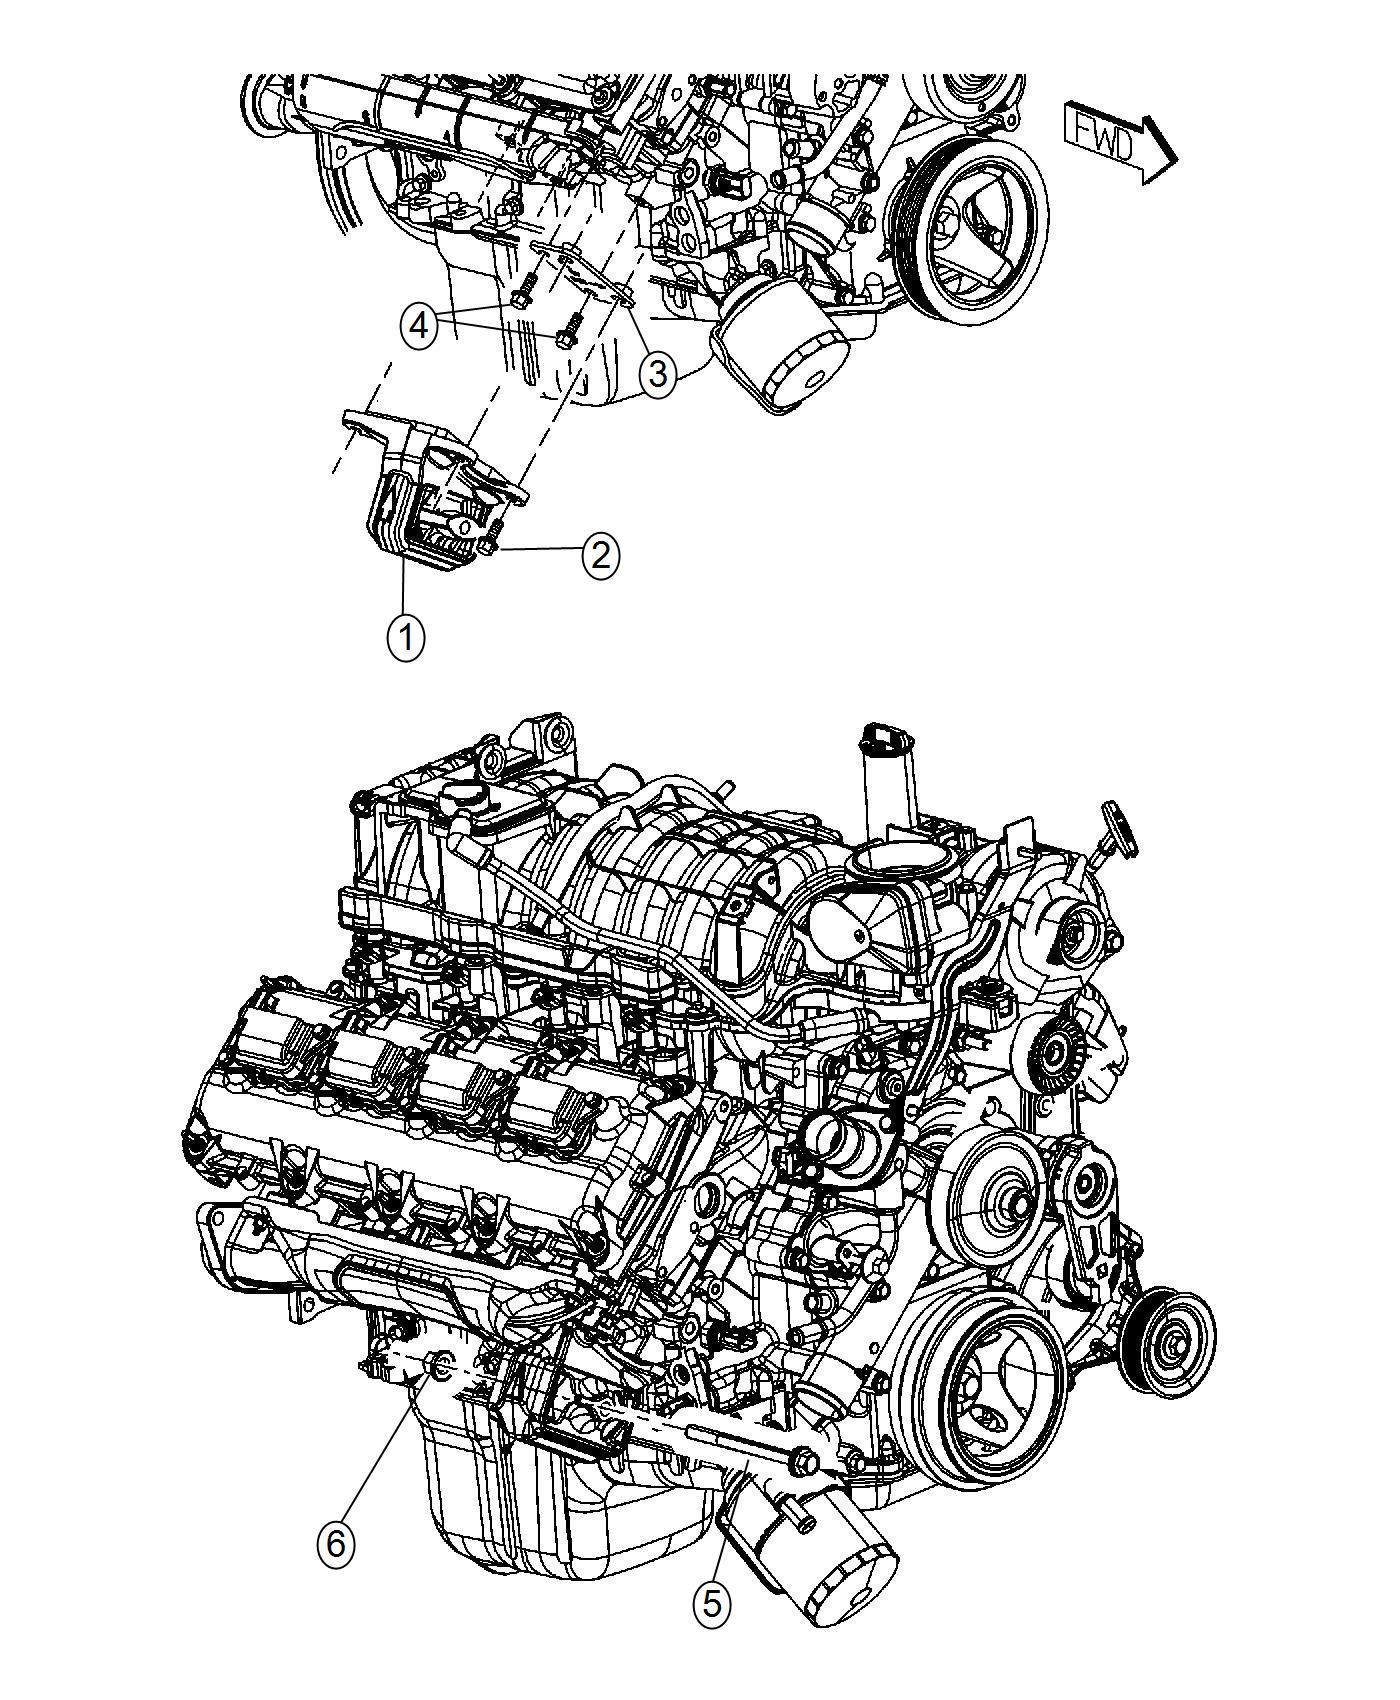 Ram Insulator Engine Mount Left Side Right Side